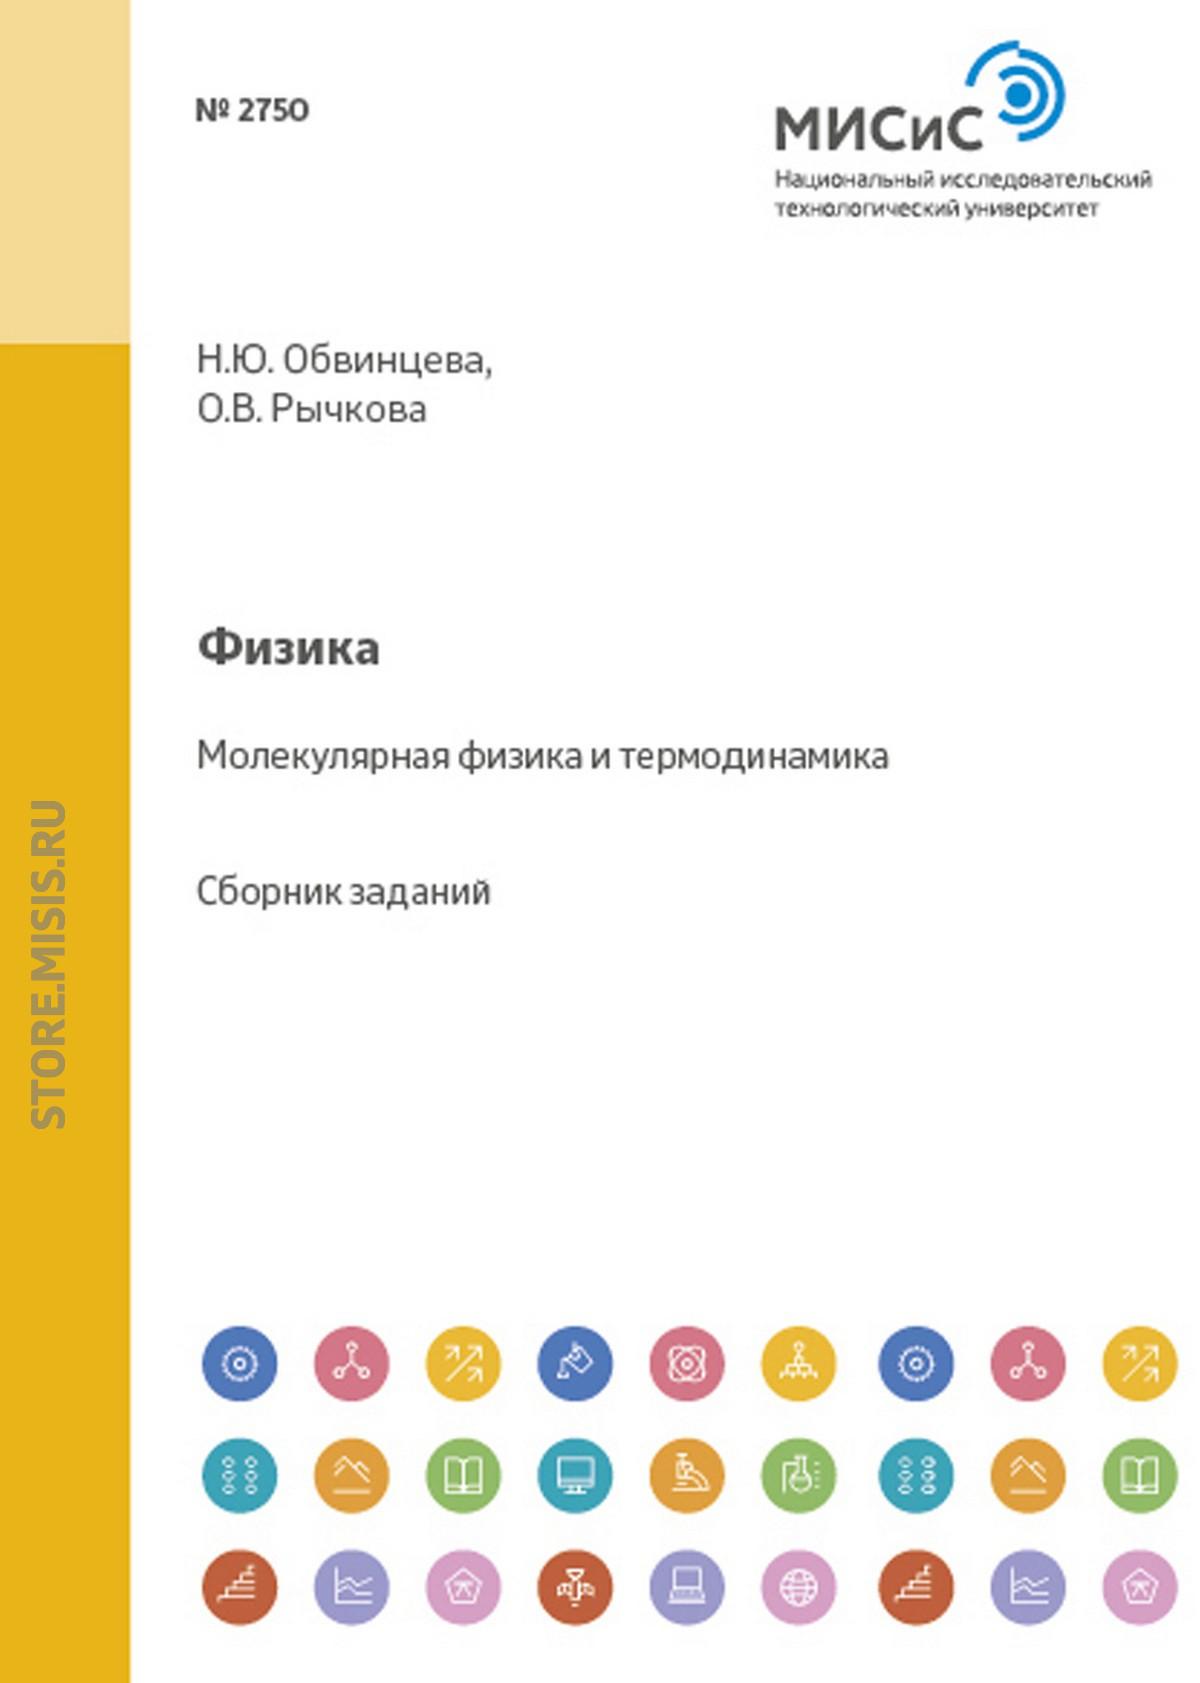 Н. Ю. Обвинцева Физика. Молекулярная физика и термодинамика в а никеров физика учебник и сборник задач